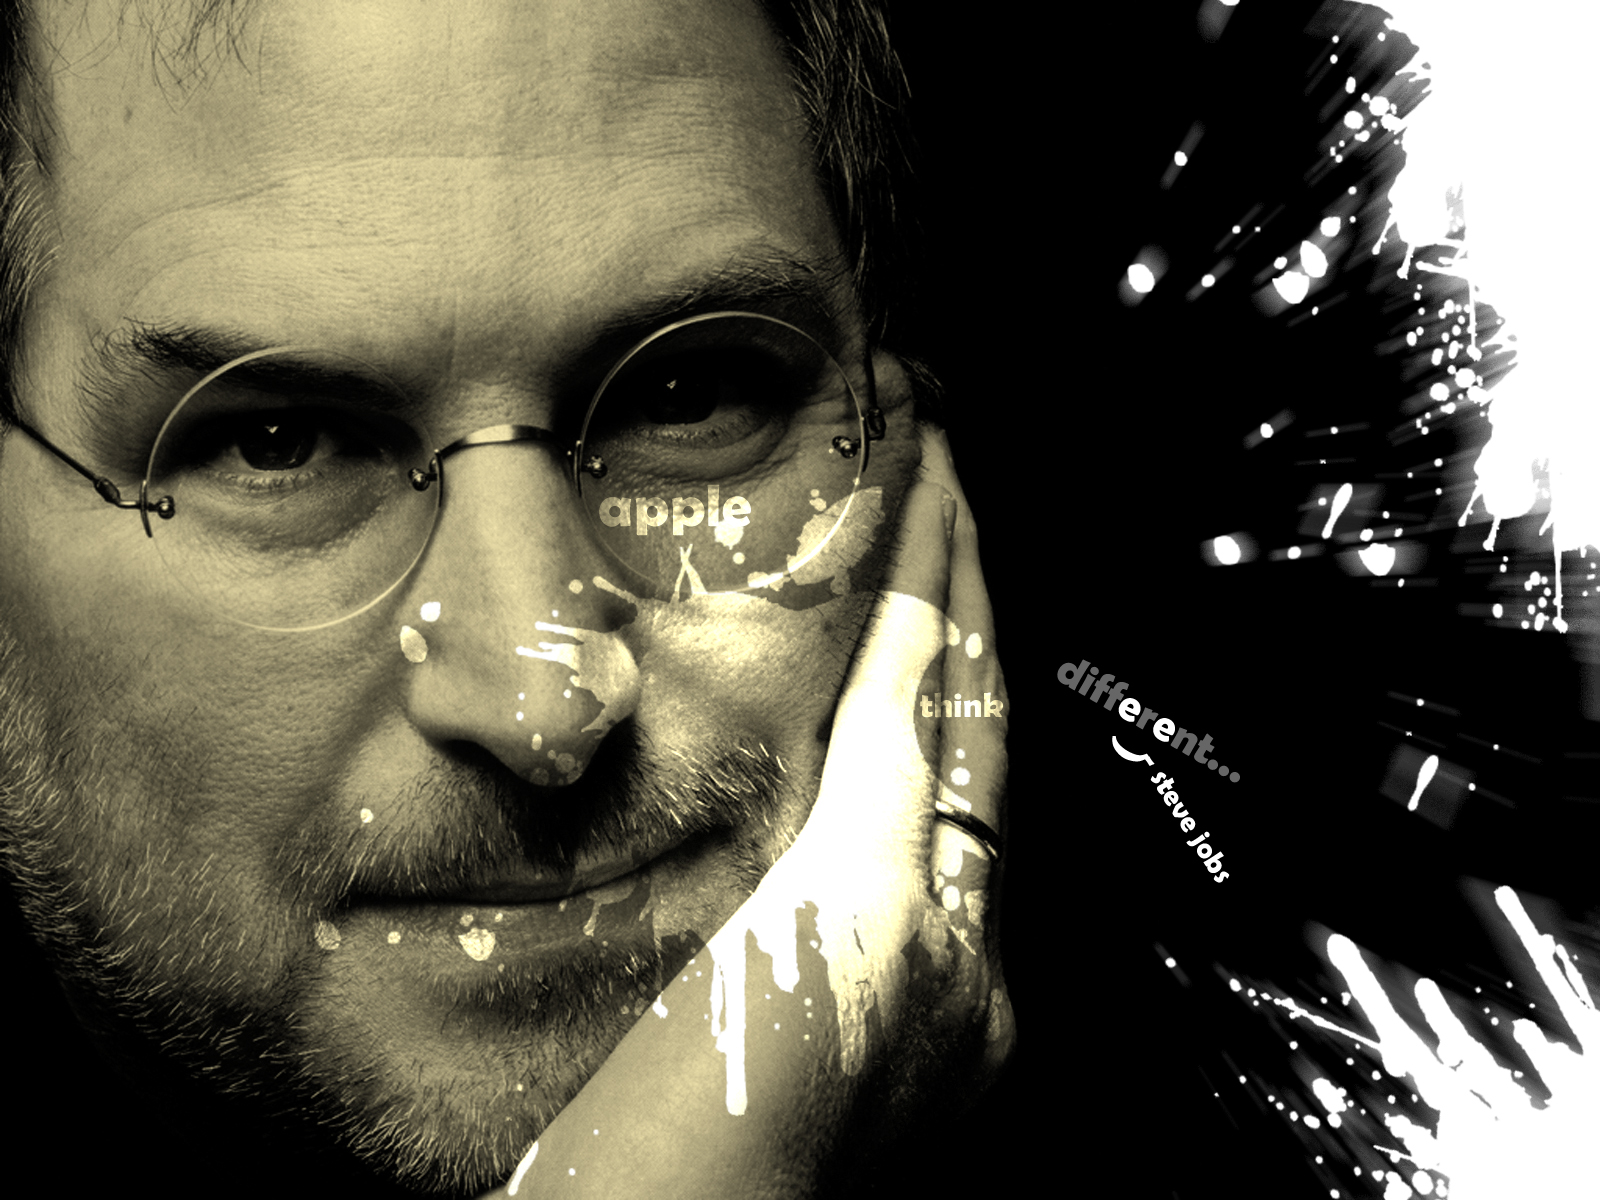 Steve Jobs Quote Tribute Design HD Wallpaper 2012 Top Model Dress 1600x1200